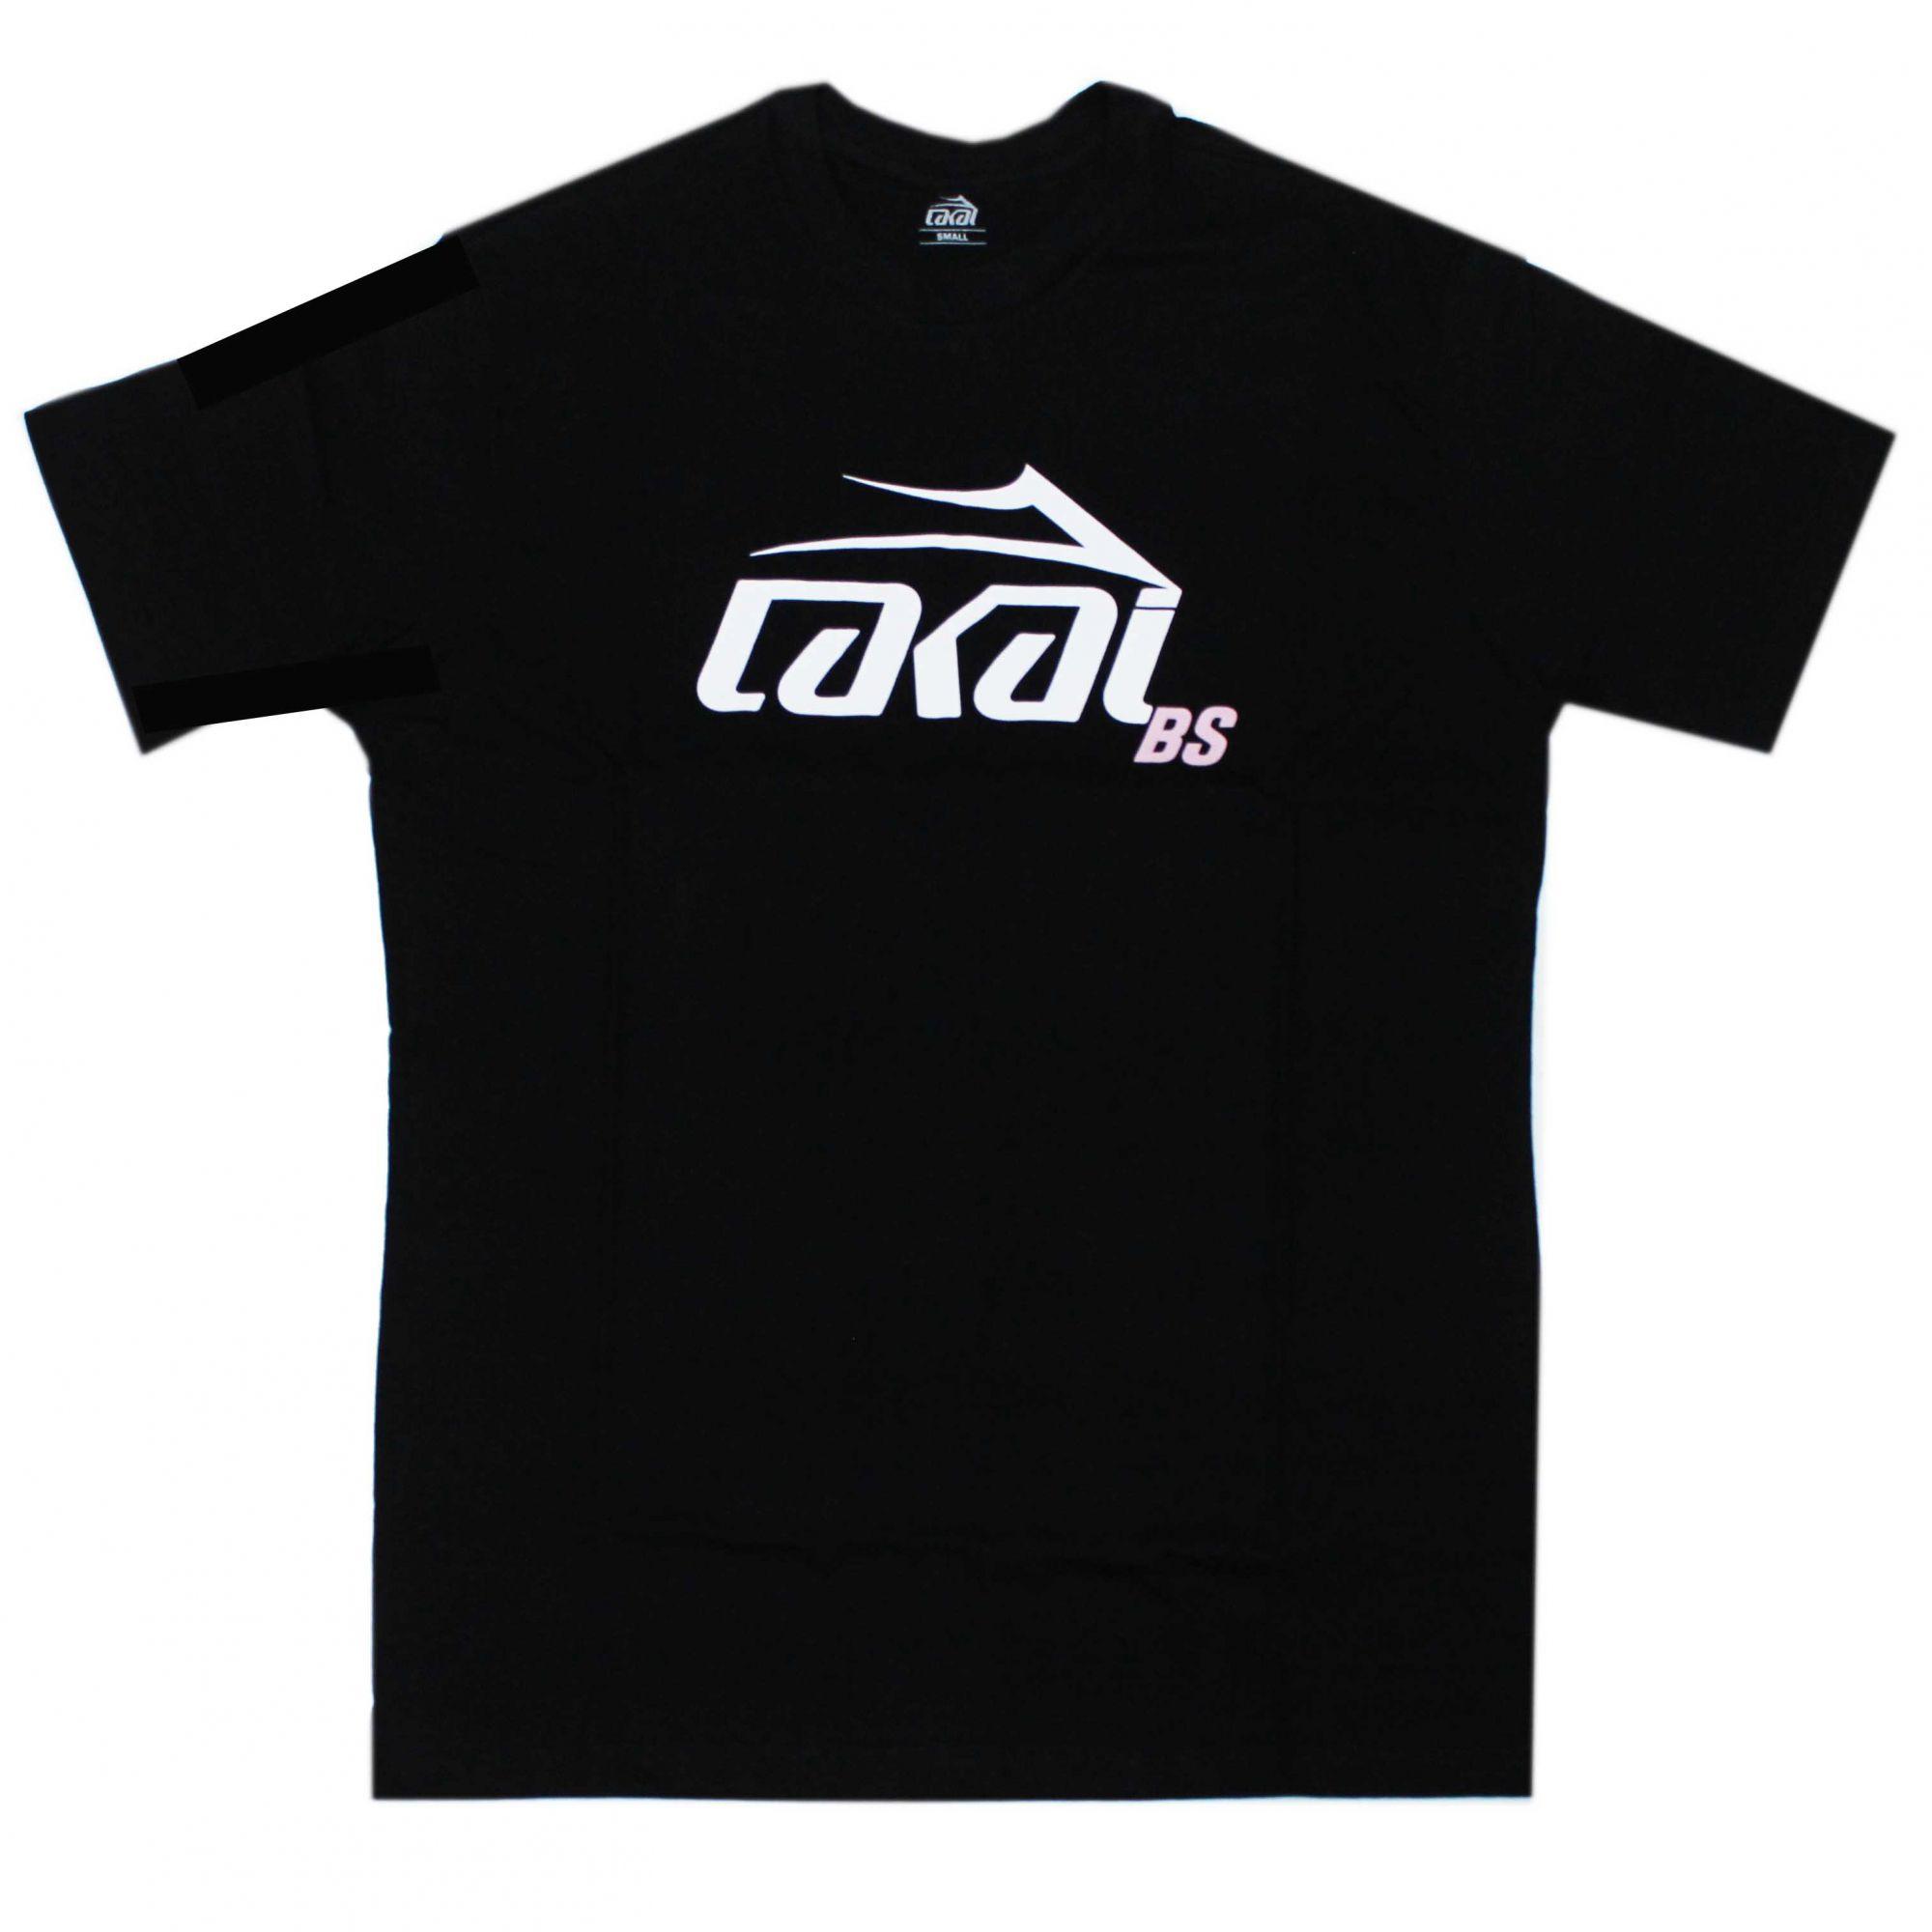 Camiseta Lakai Bullshit Preto